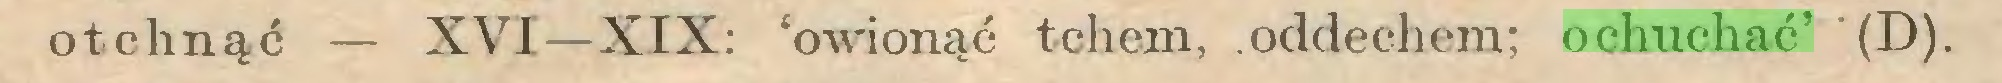 (...) otchnąć — XVI —XIX: 'owionąć tchem, oddechem; ochuchać' '(D)...